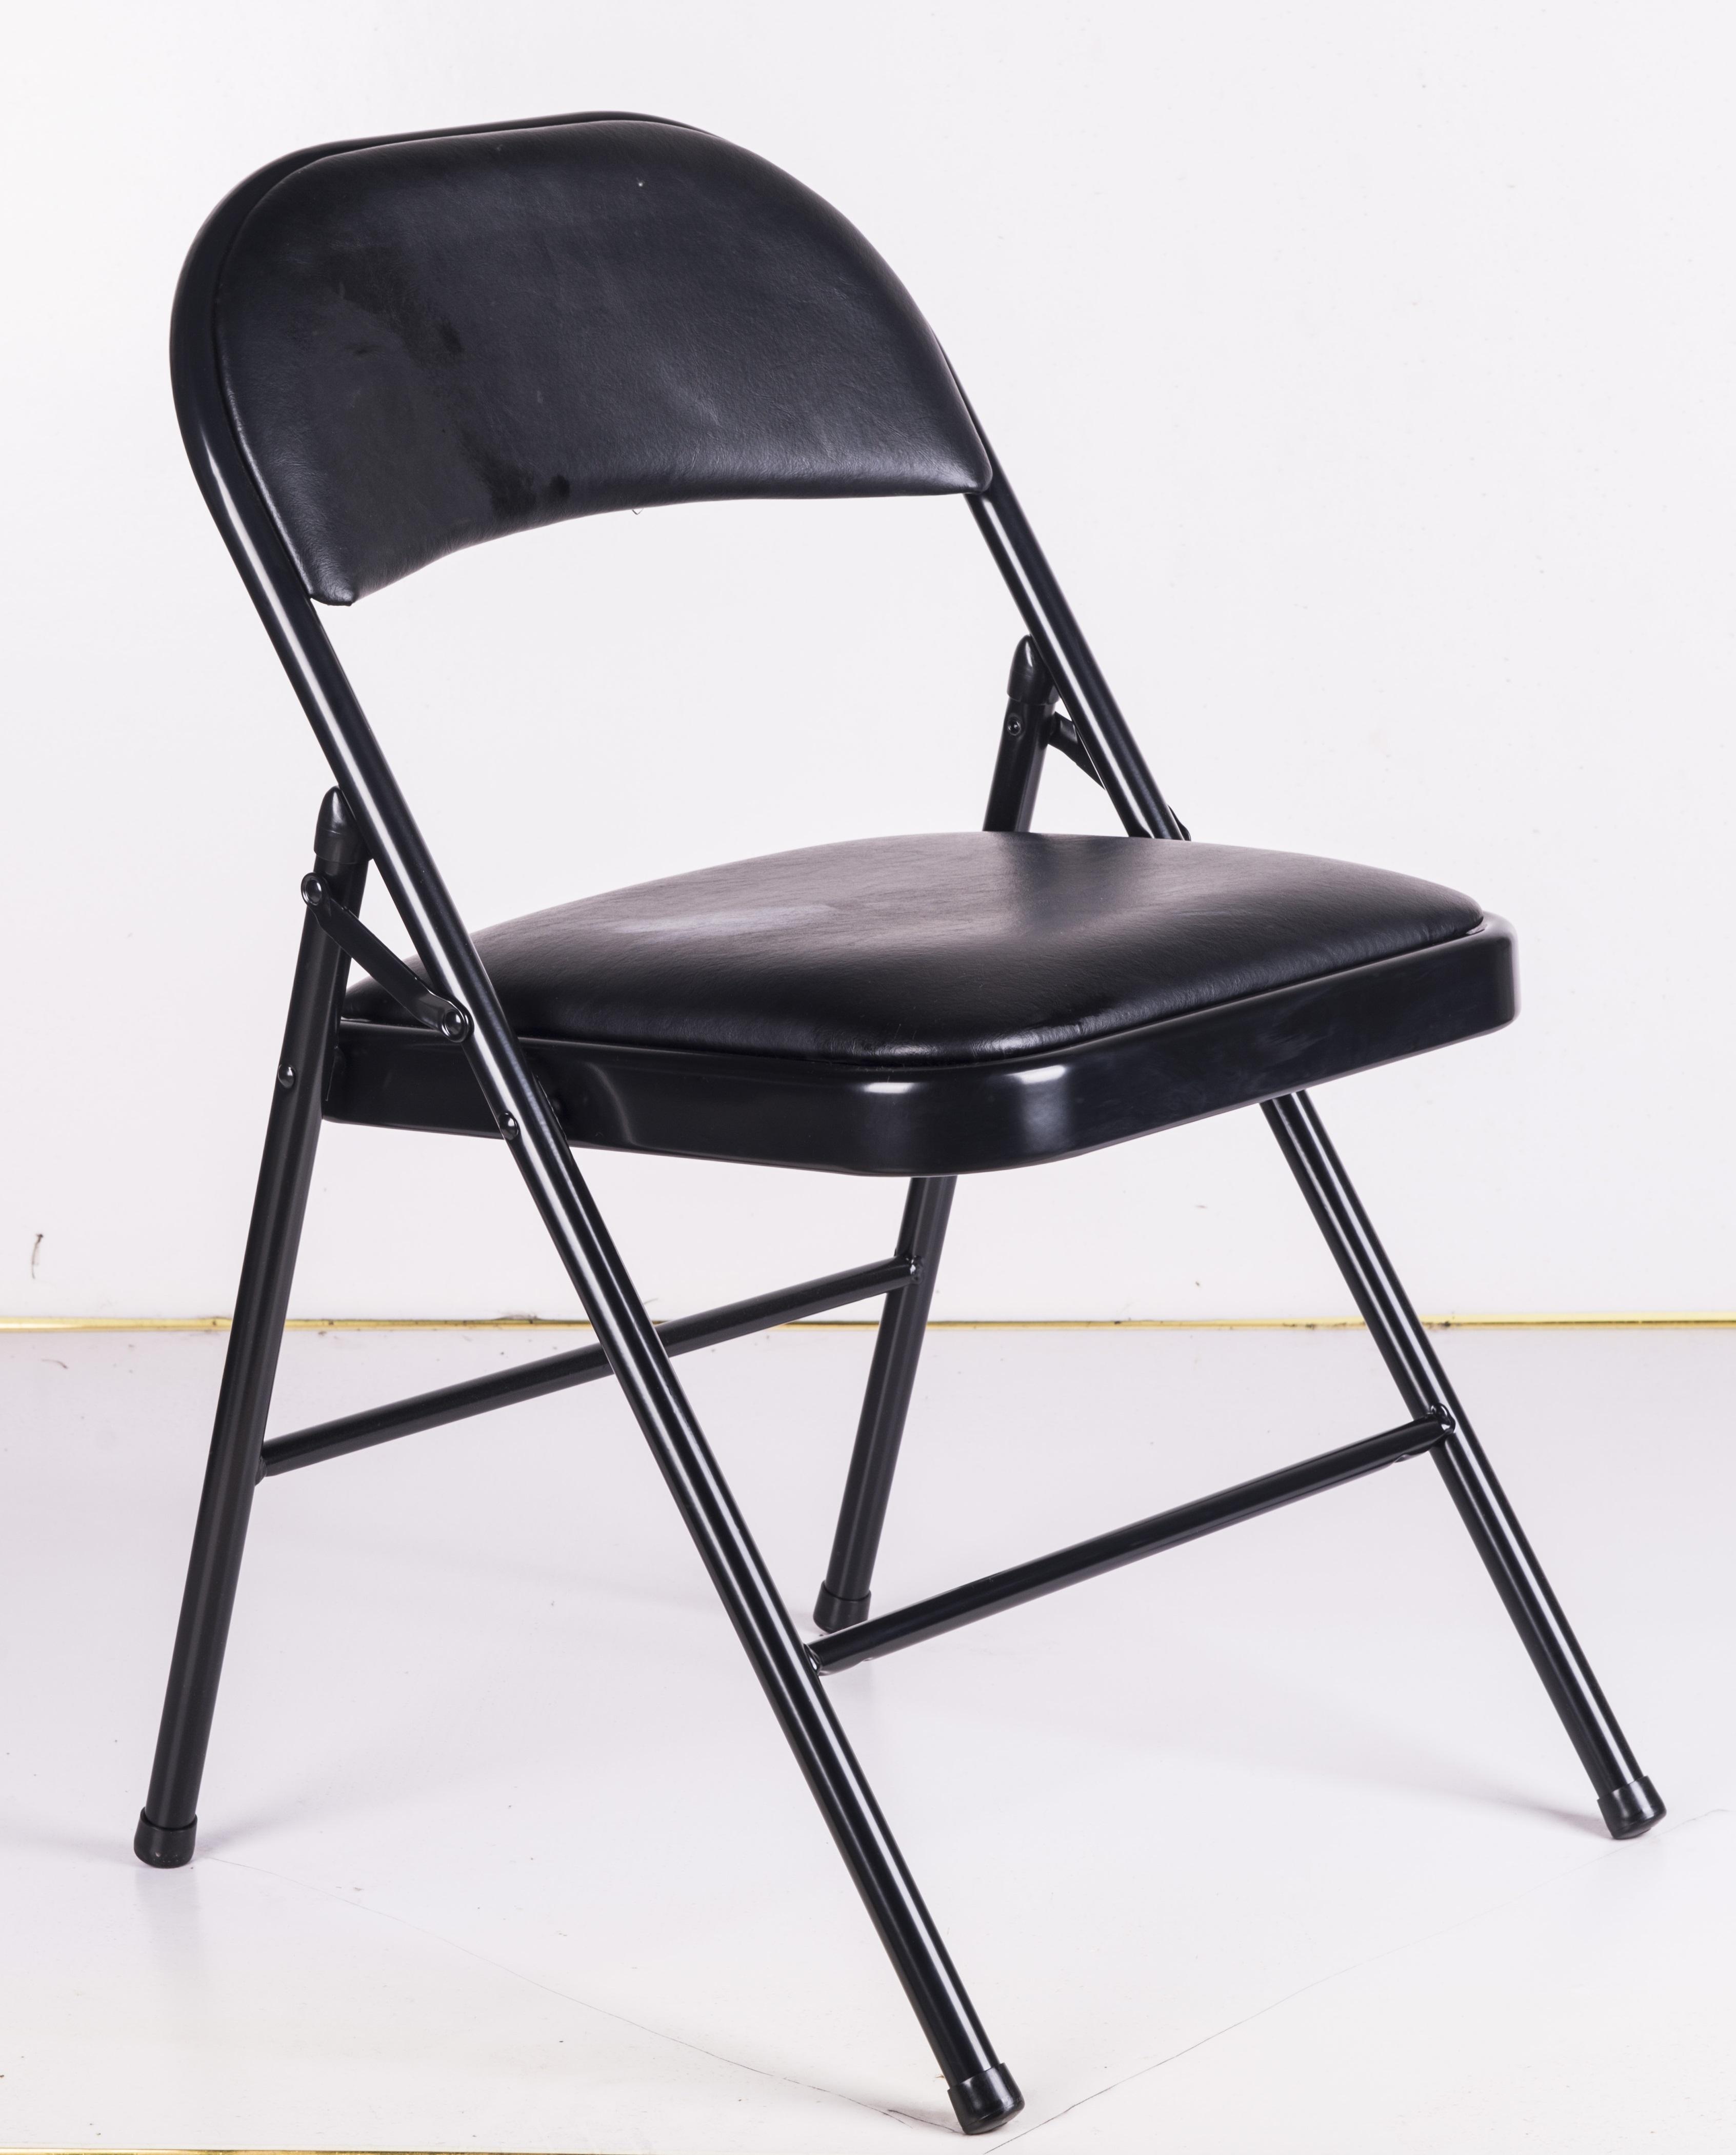 sillas plegables eventos baratoas